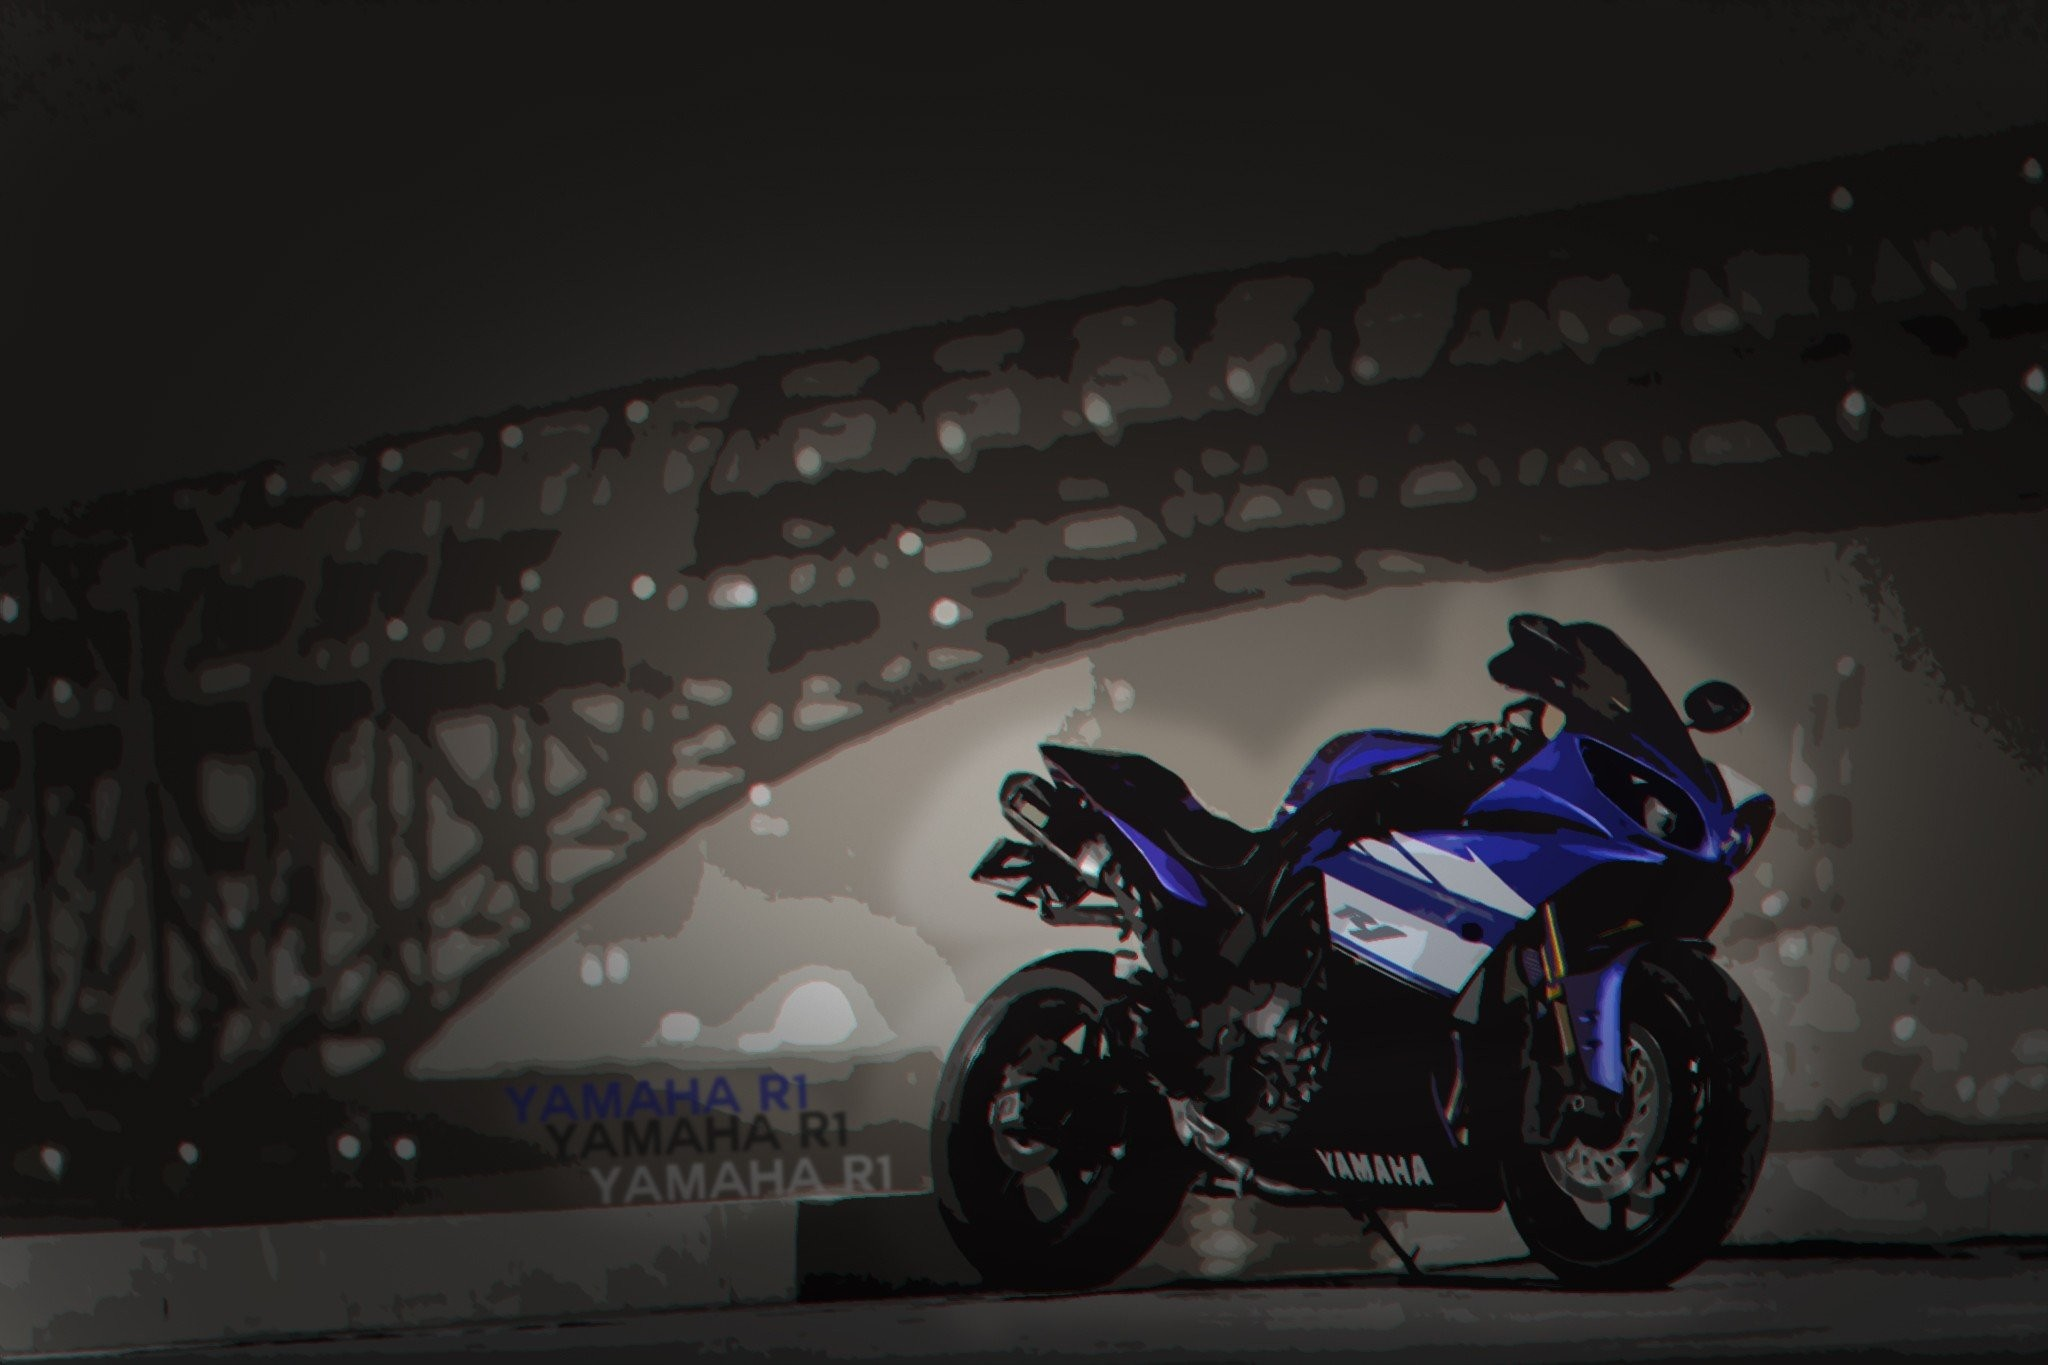 Res: 2048x1365, motorcycle, Yamaha R1, Yamaha YZF R1